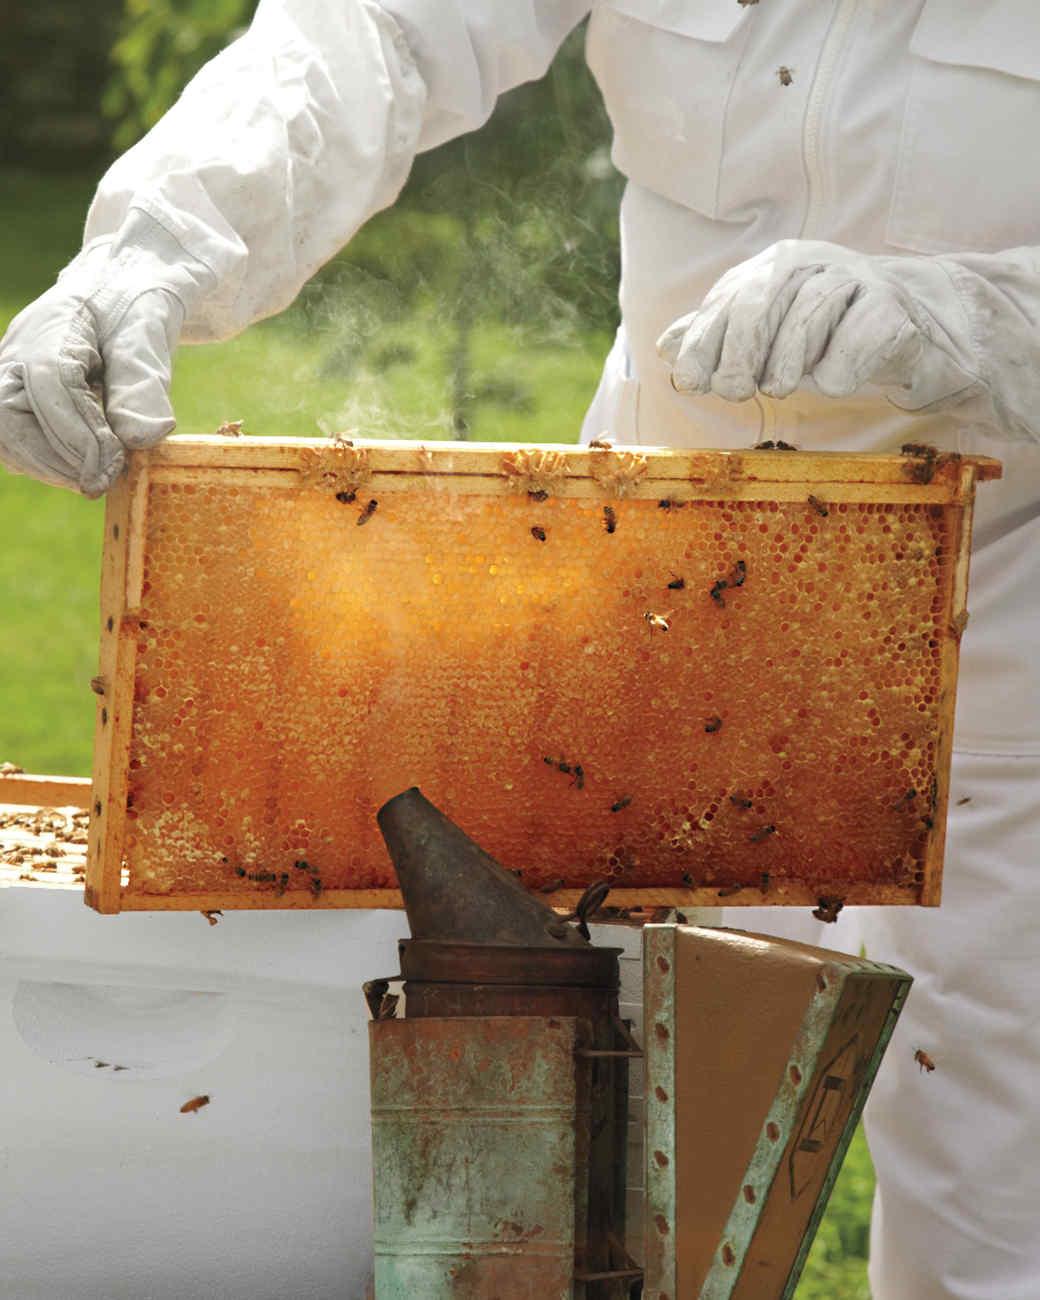 hive-maintenance-5-ms-column-0672-mld106618.jpg